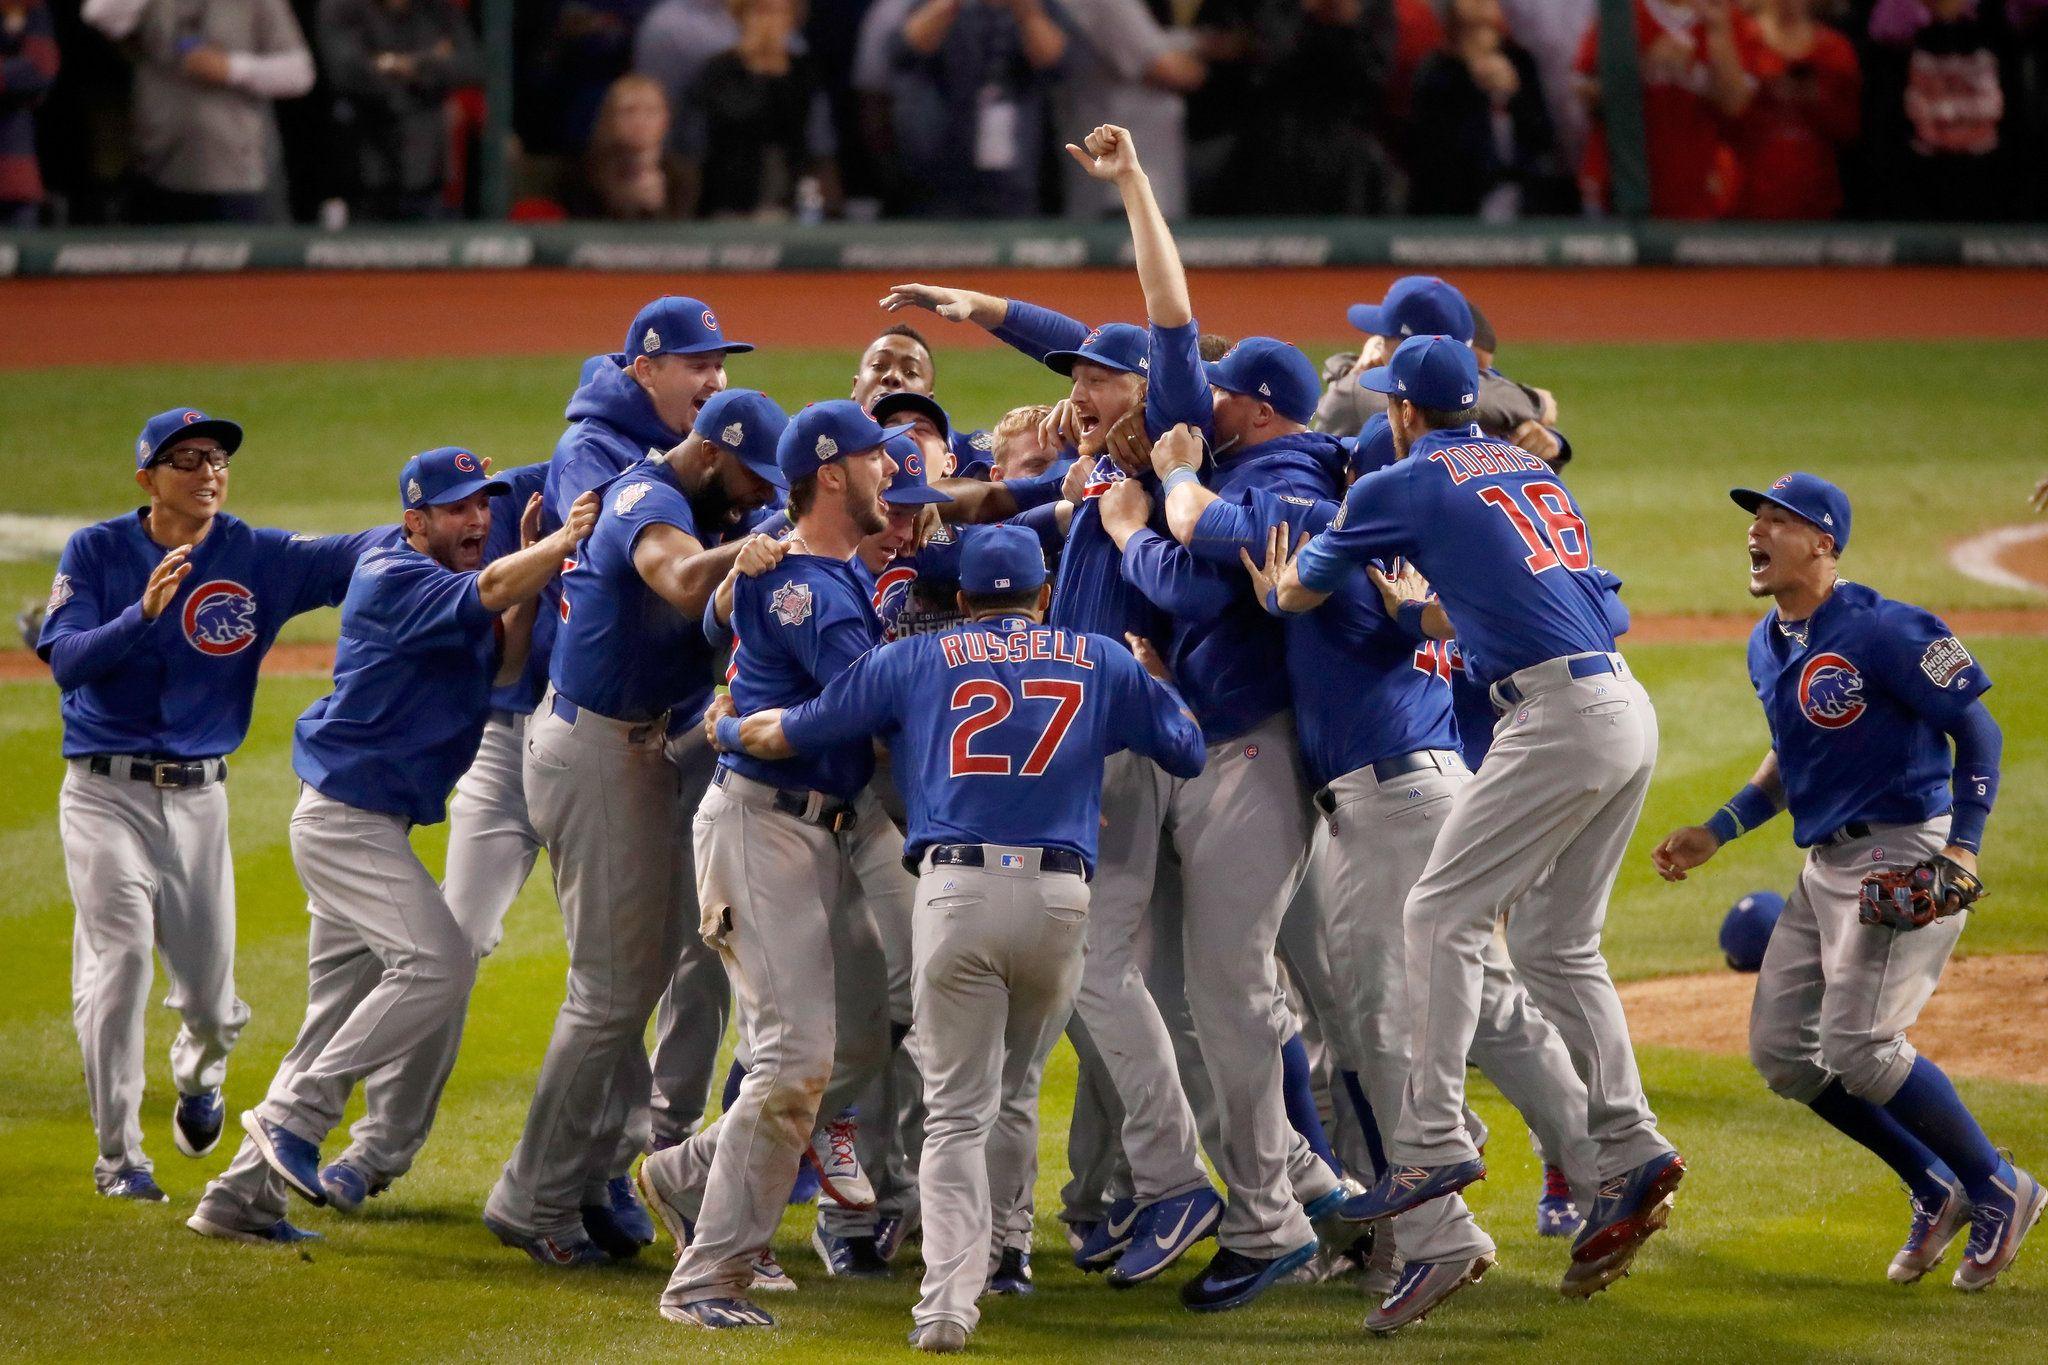 Chicago Cubs Tickets Cheap Cubs World Series Chicago Cubs World Series Chicago Cubs